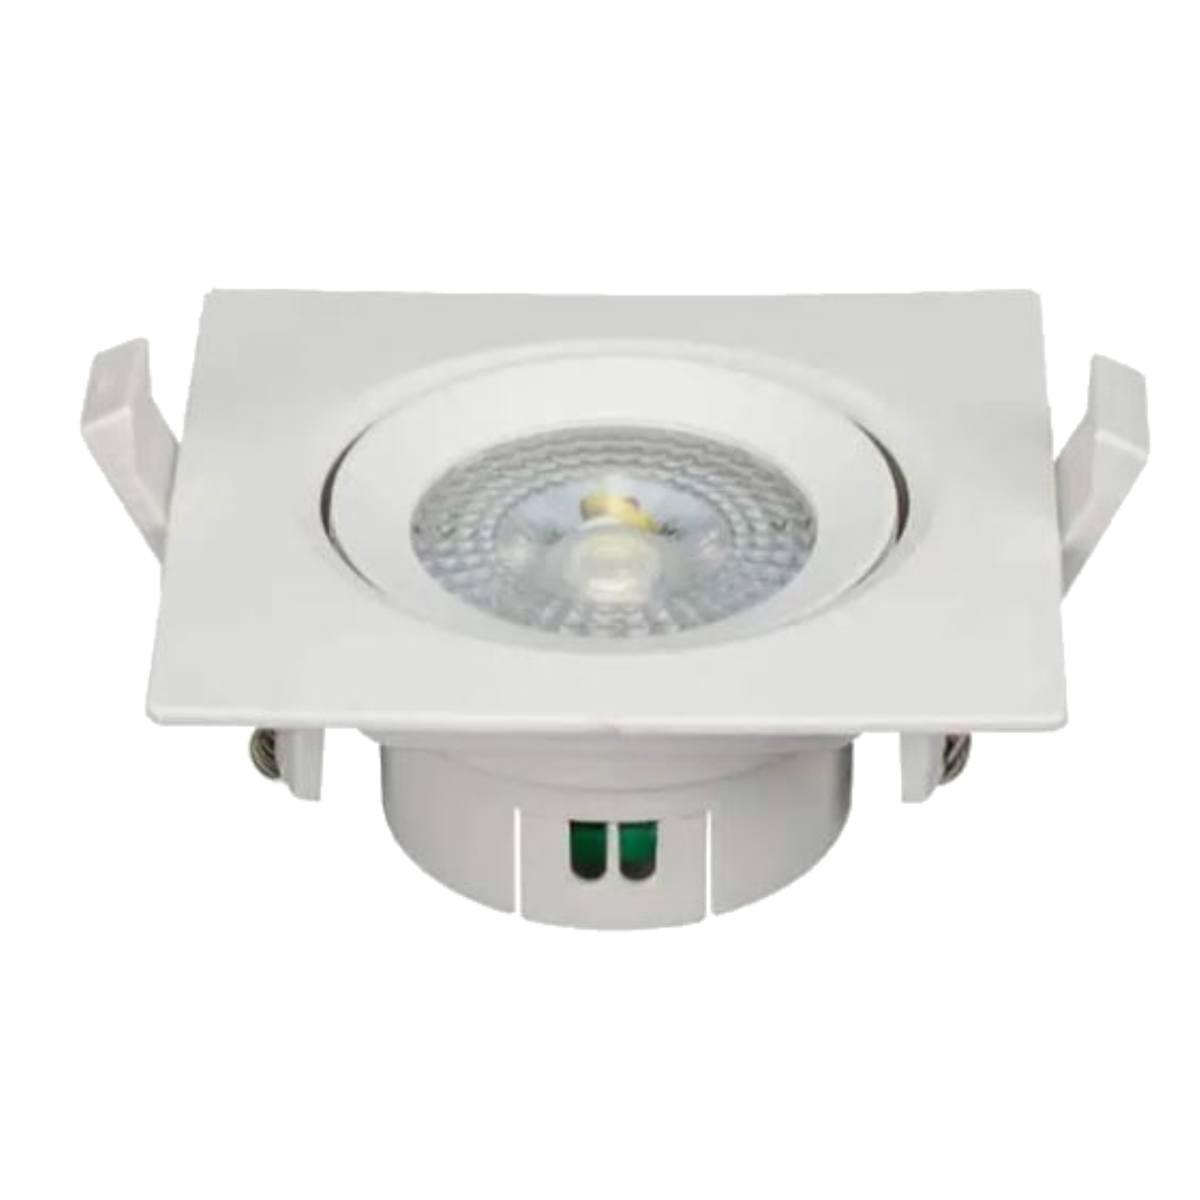 Kit 10 Spot Led 5w Lampada Direcionável Branco Quente 3000K OL